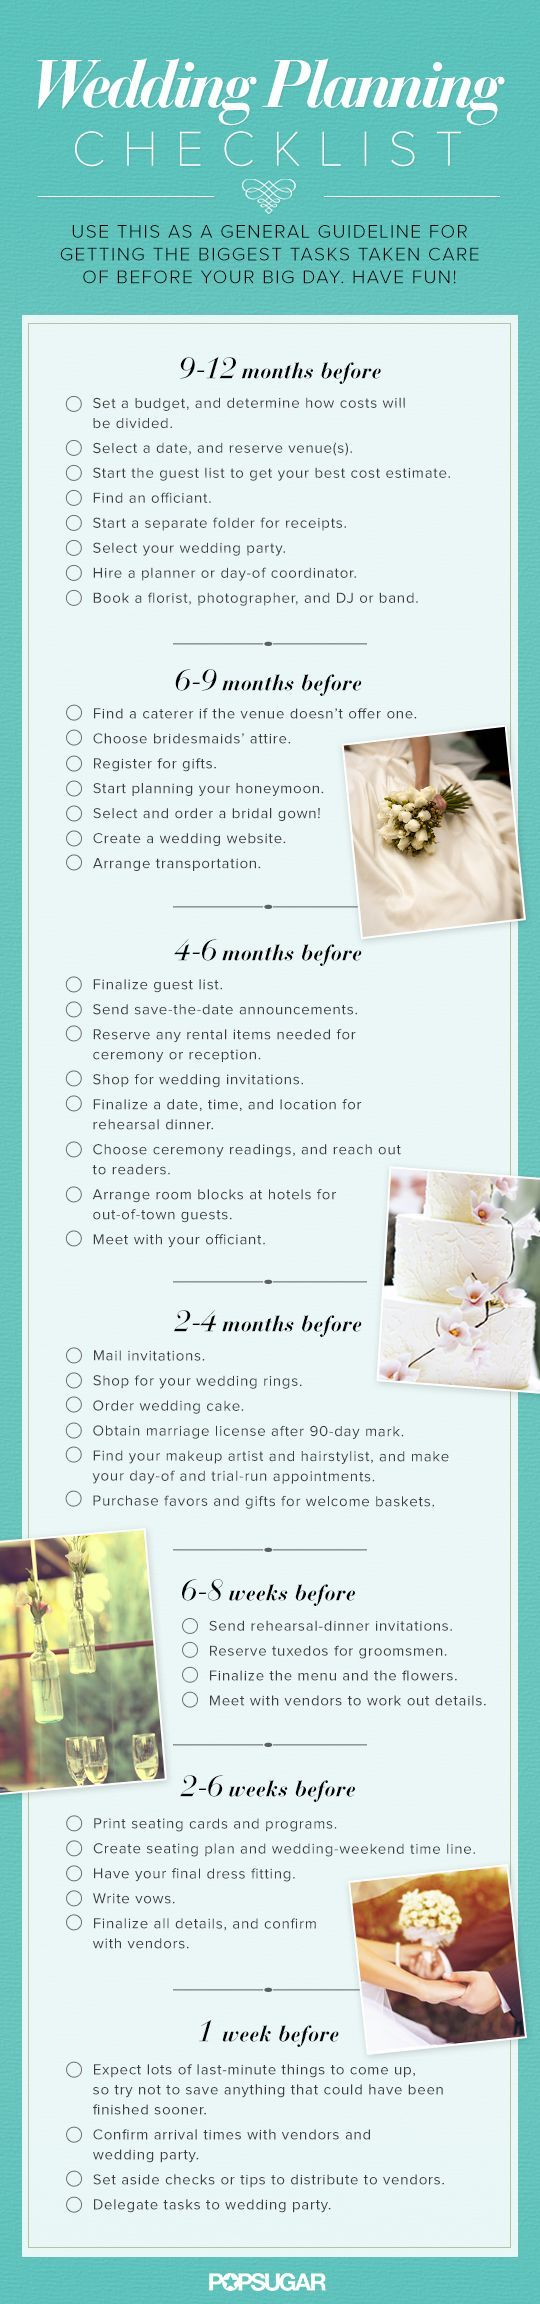 A Super Helpful 12 Month Wedding Planning Checklist to help you get organized: http://www.modwedding.com/2014/10/06/top-5-wedding-planning-checklists-keep-track/ #wedding #weddings #wedding_planning_checklist